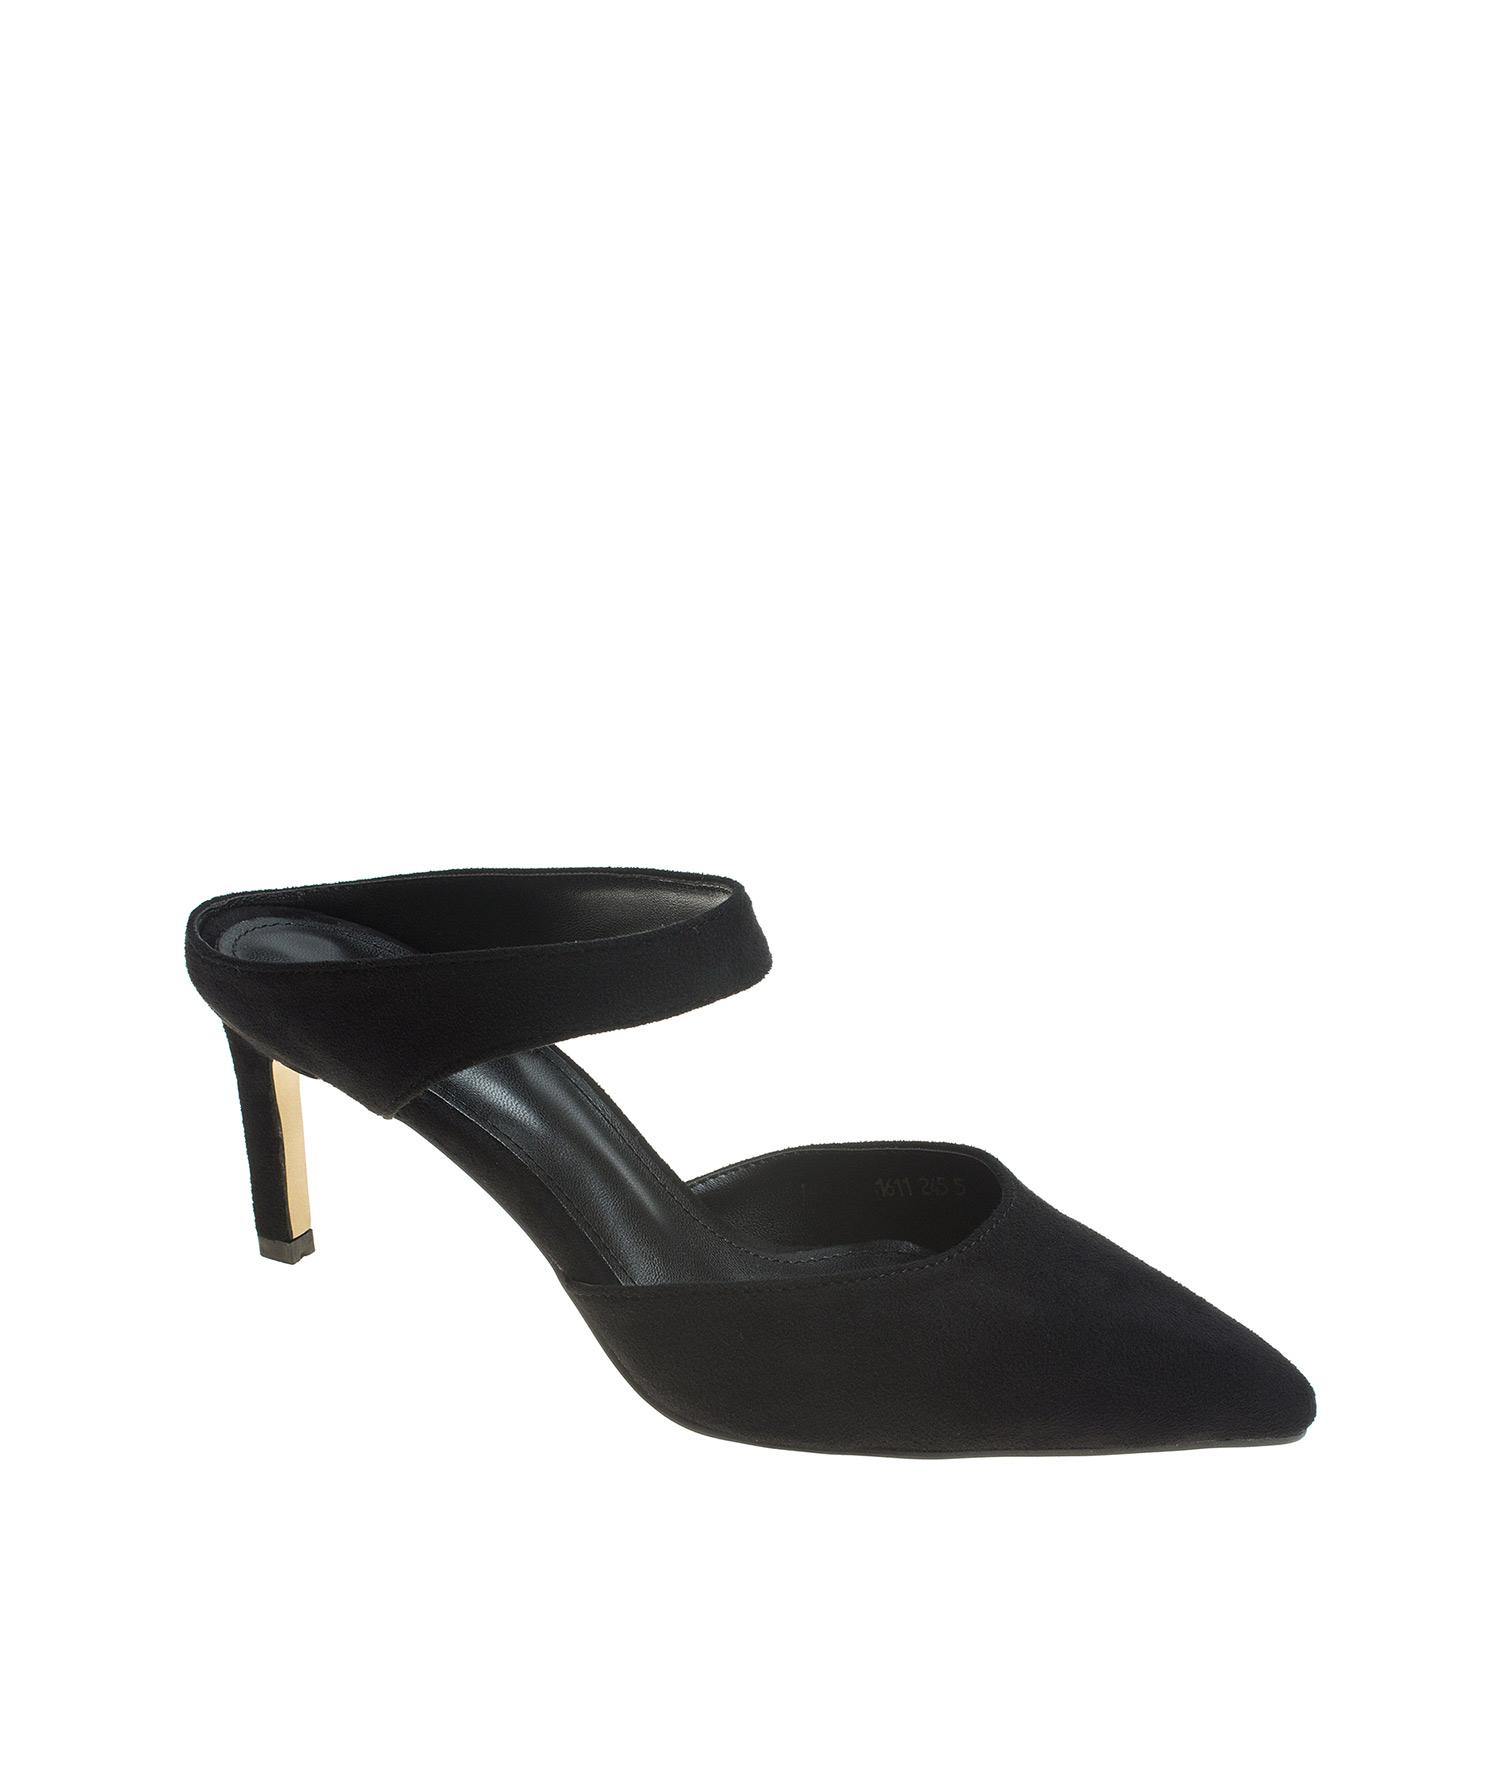 ec765b64f42 AnnaKastle Womens Ankle Strap Closed Toe Heel Mules Suede Black